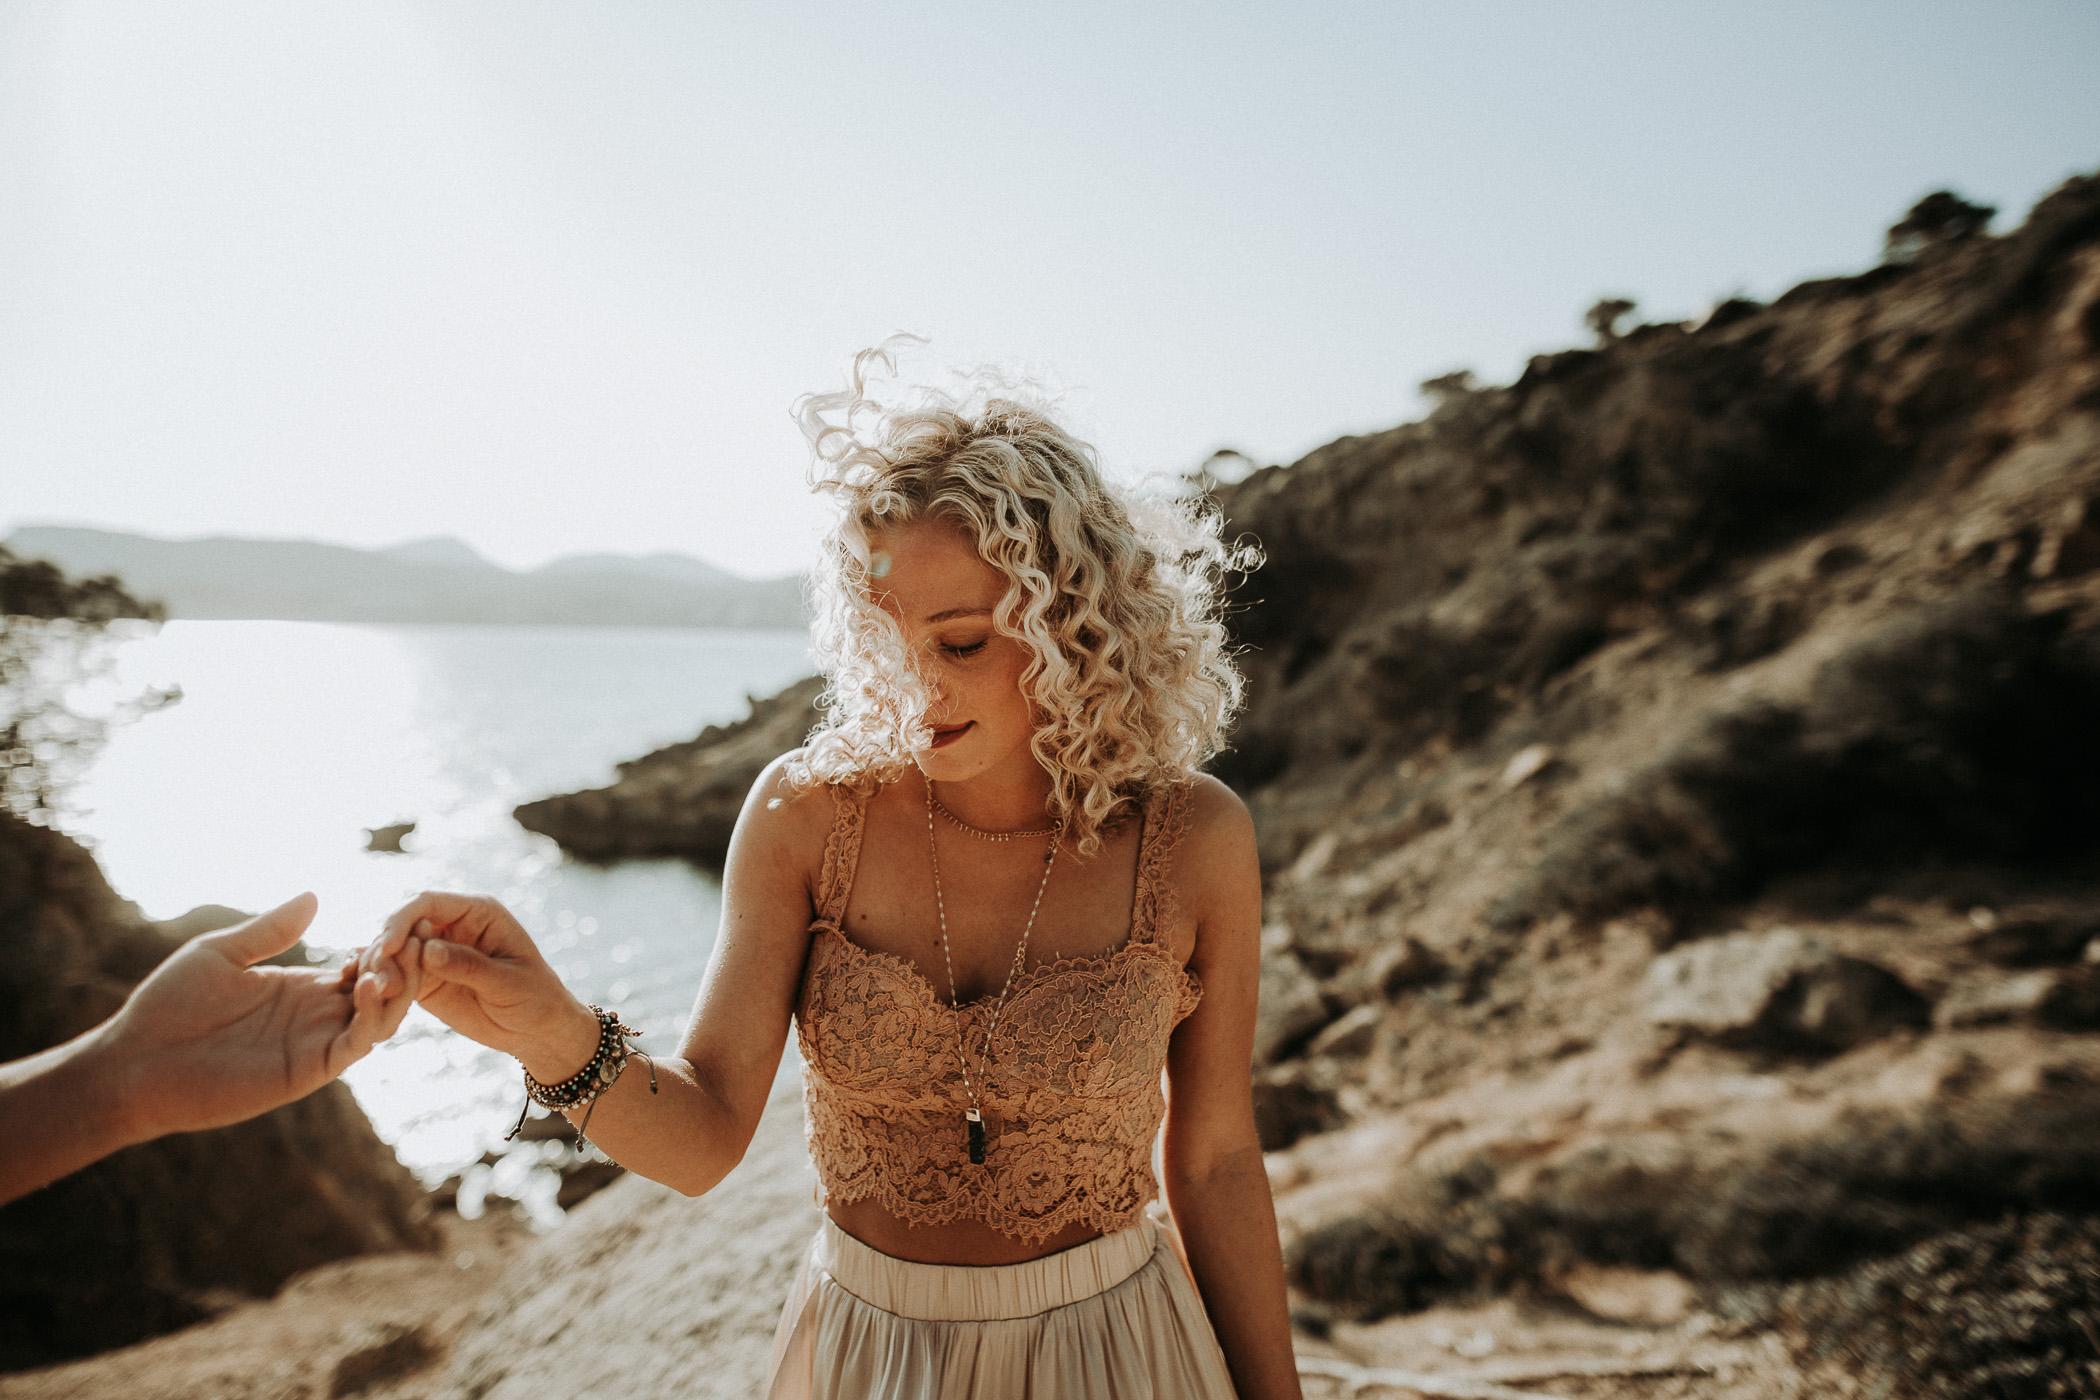 DanielaMarquardtPhotography_elopement_mallorca_spain_paguera_palma_charlyandbela_23